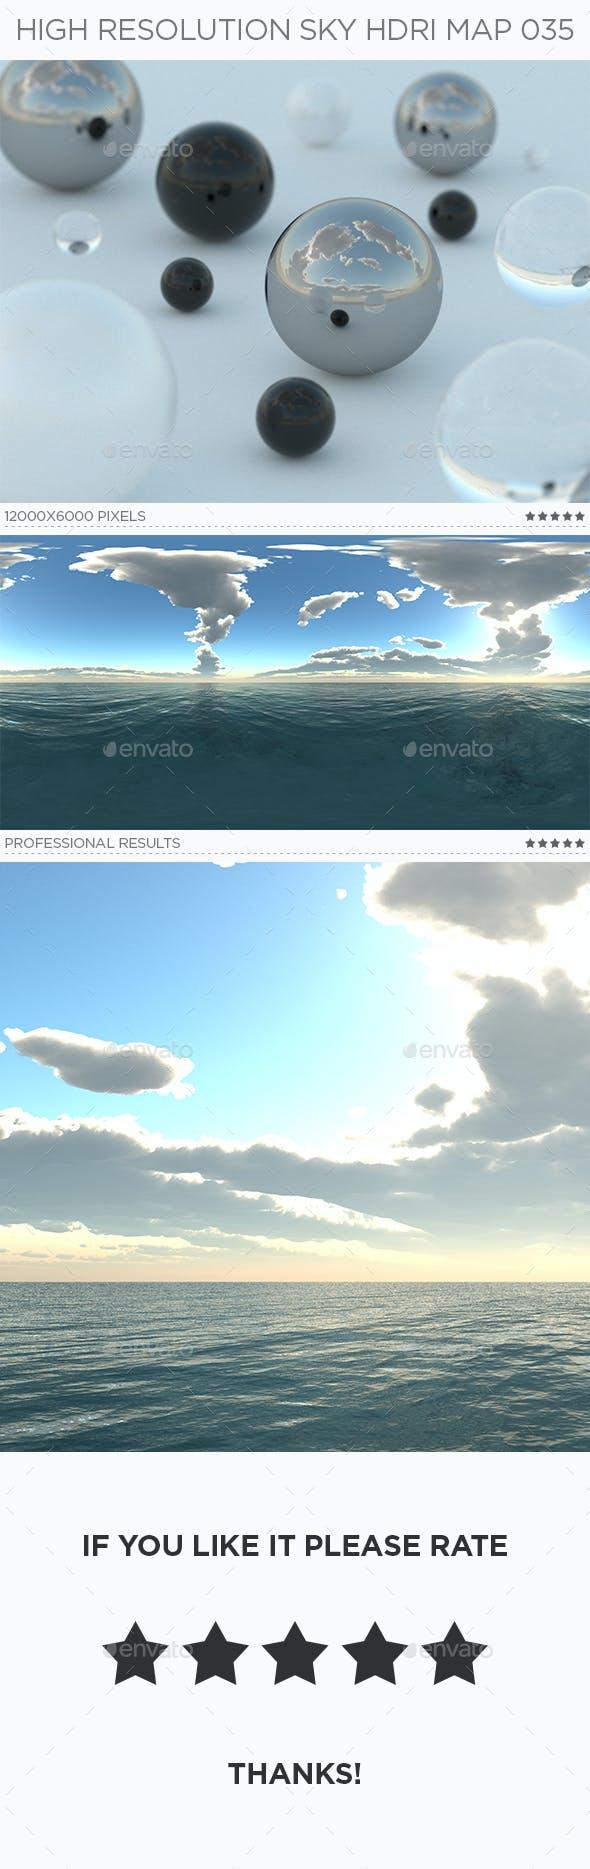 High Resolution Sky HDRi Map 035 - 3DOcean Item for Sale